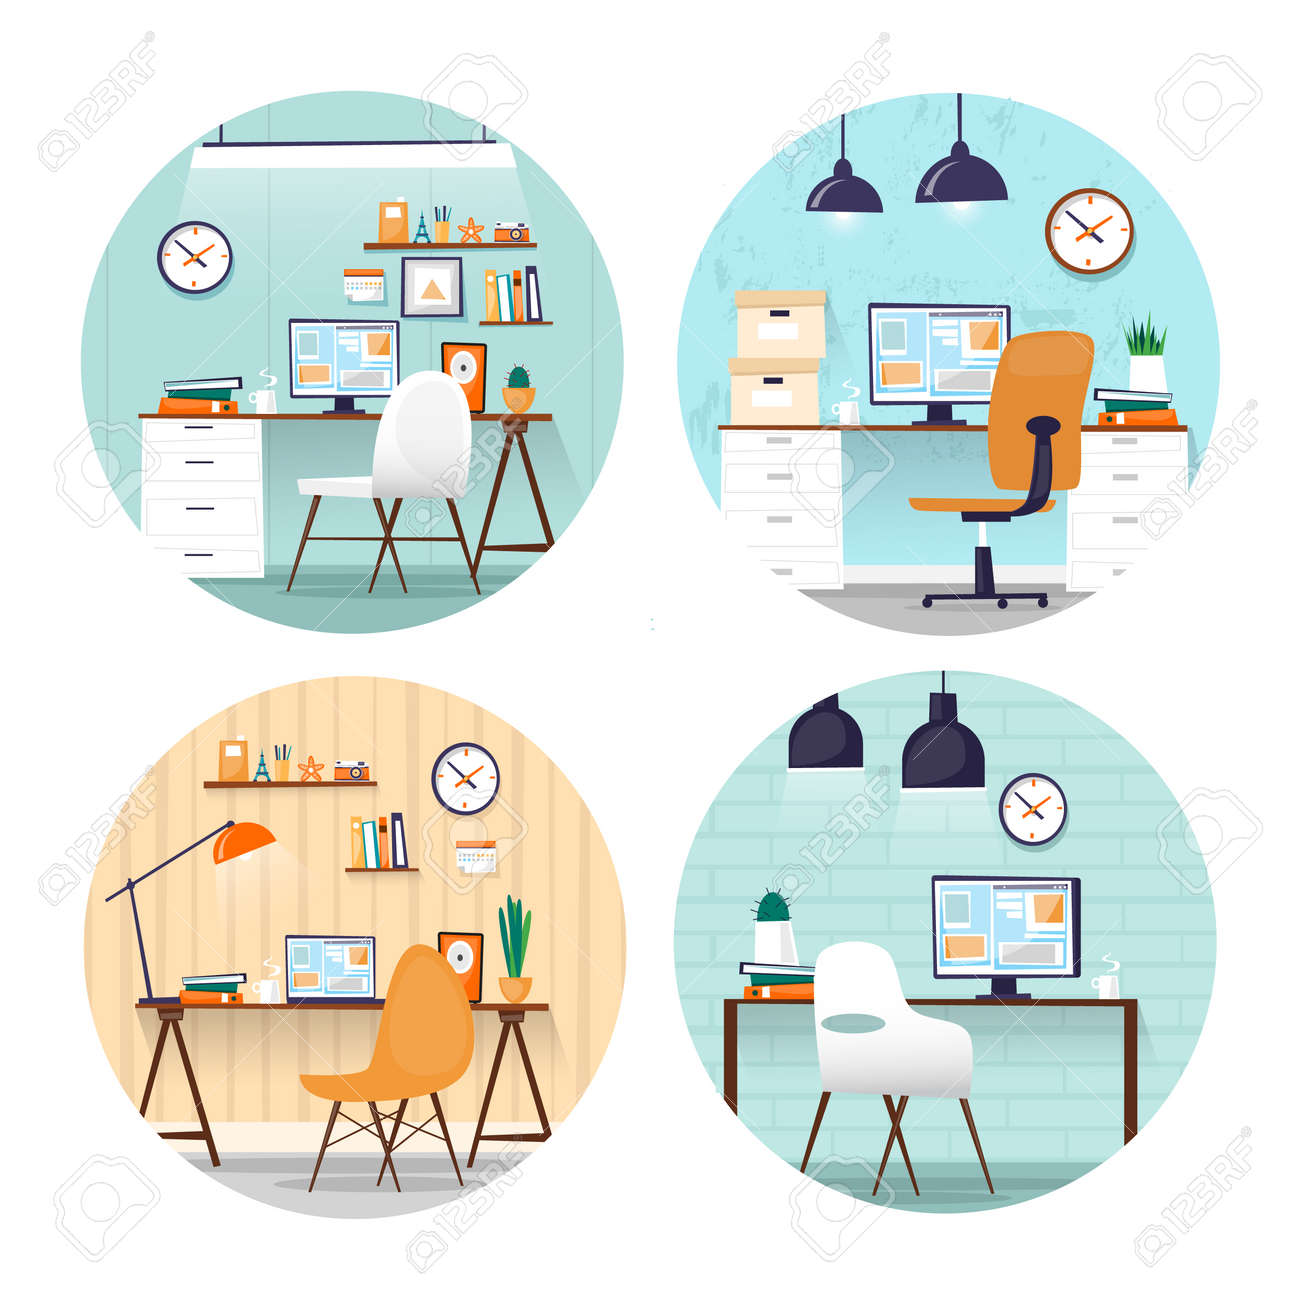 Office Arbeitsplatz Geschaft Buroarbeit Zimmer Unter Marketing